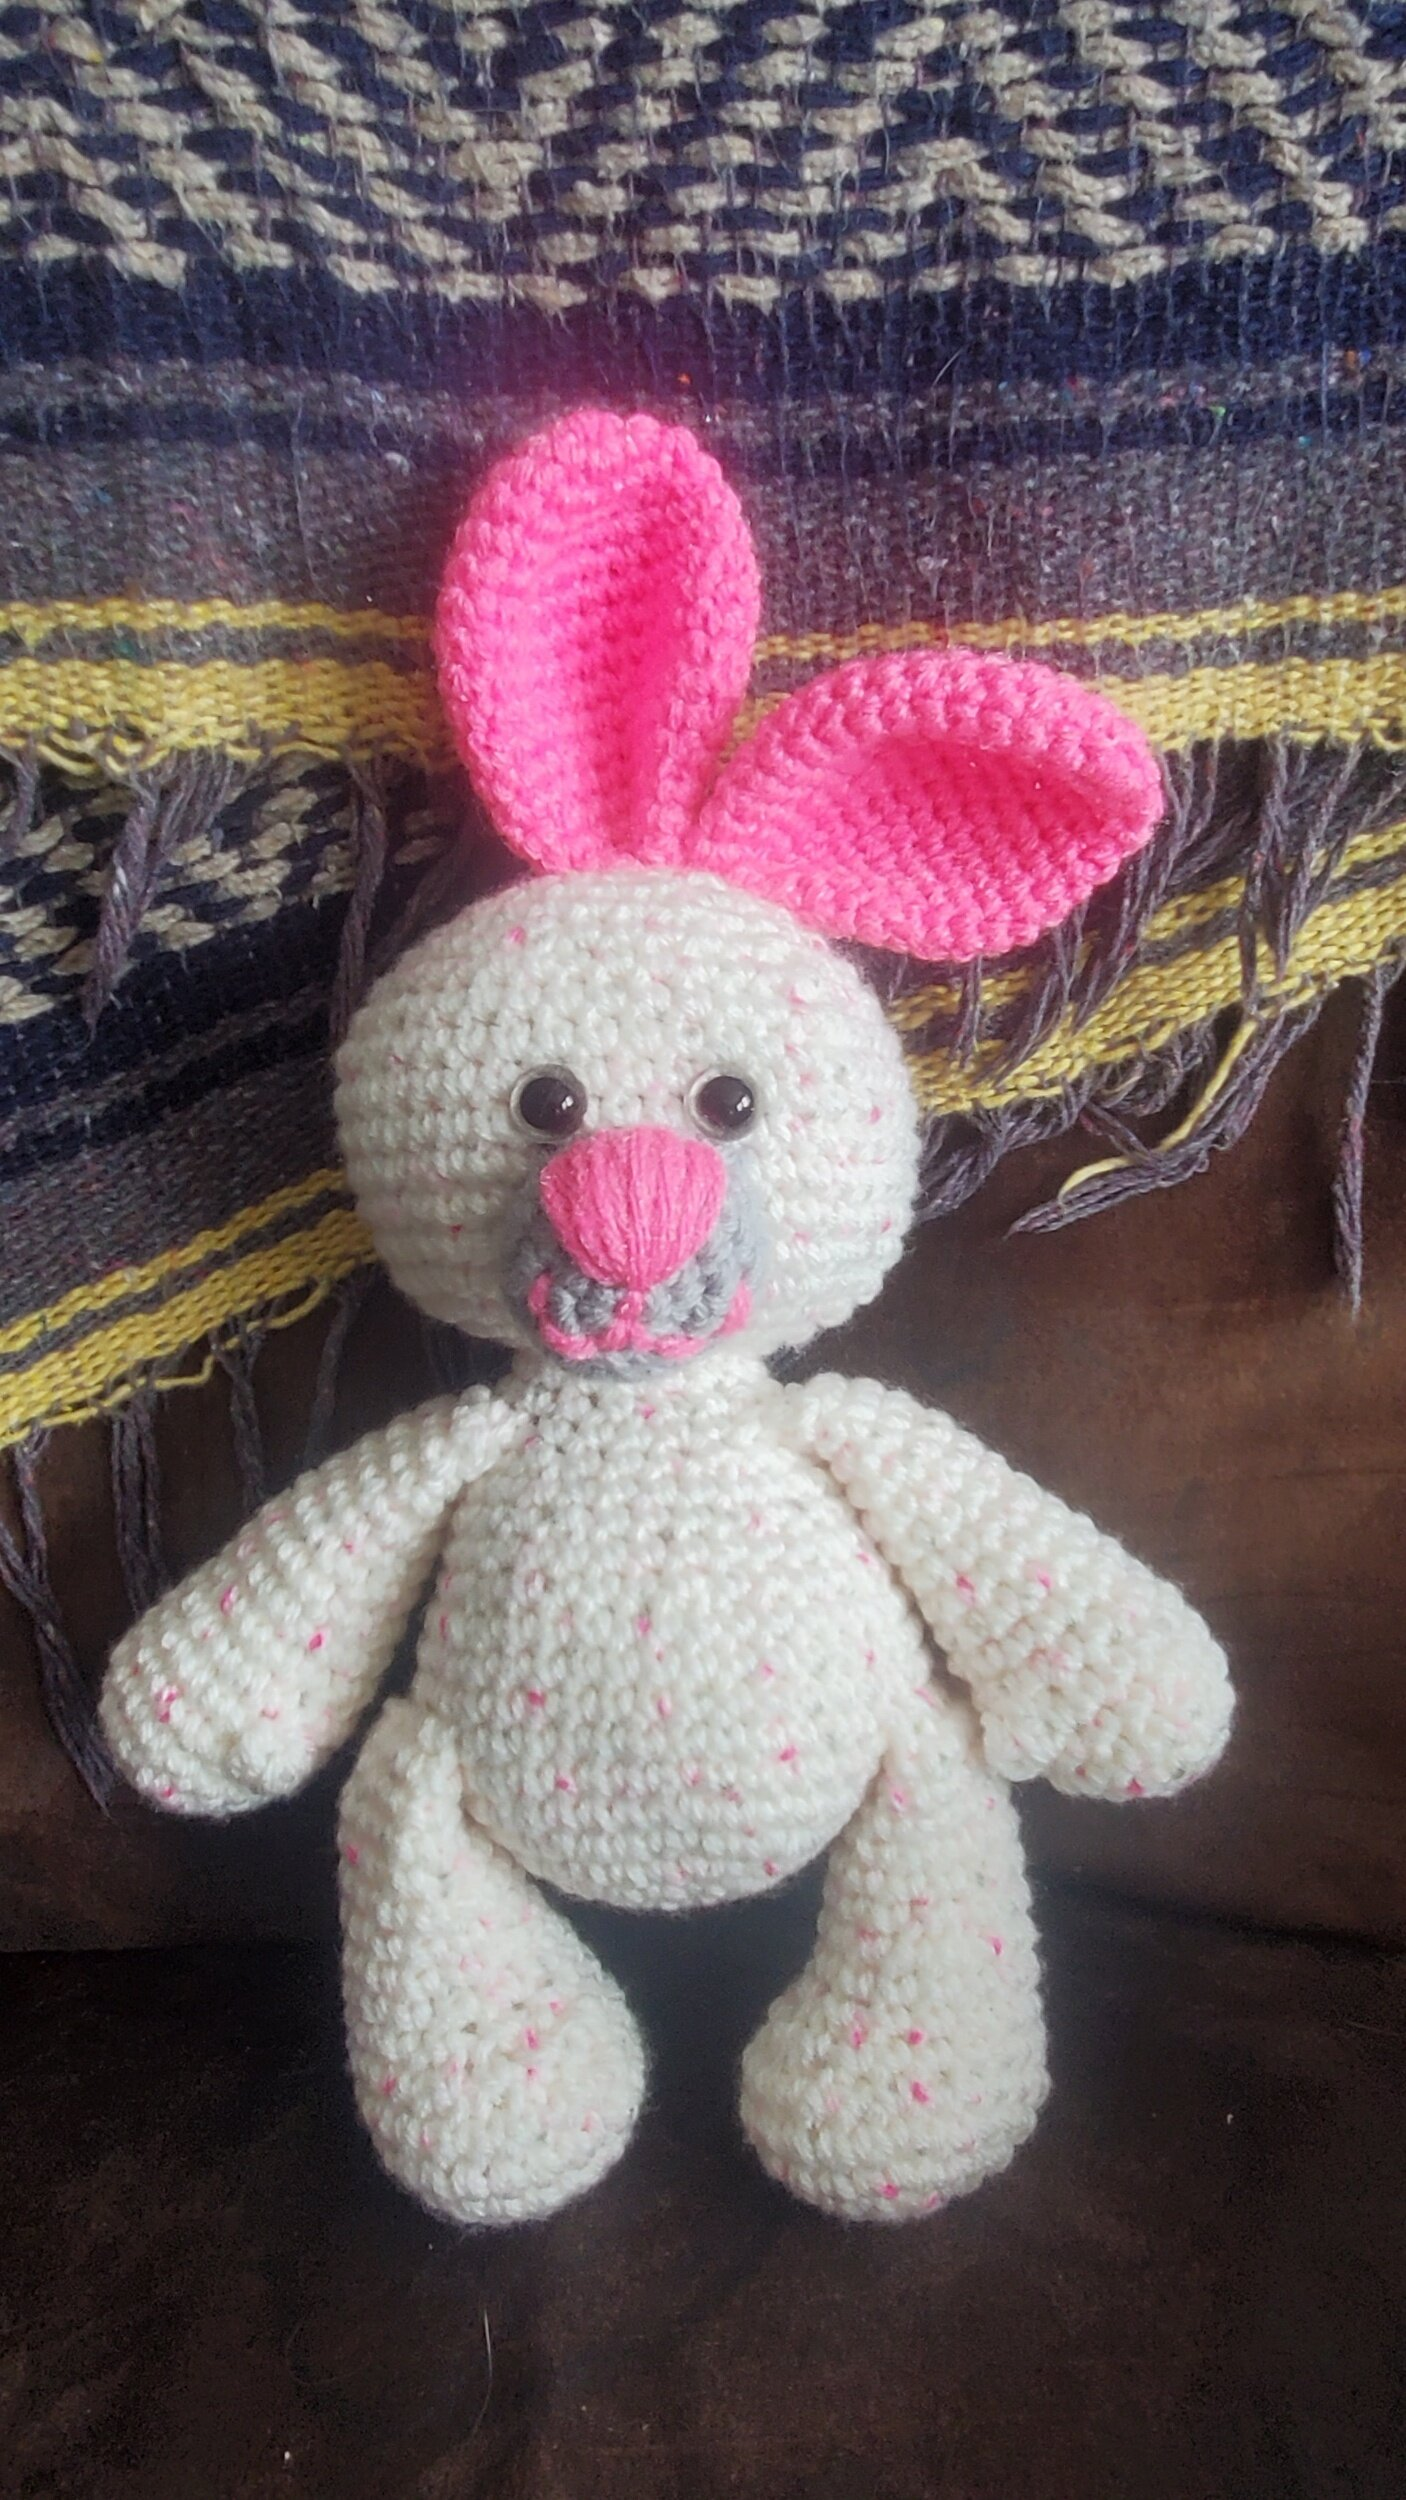 Small teddy bear amigurumi keychain crochet - Amigu World | 1778x1000